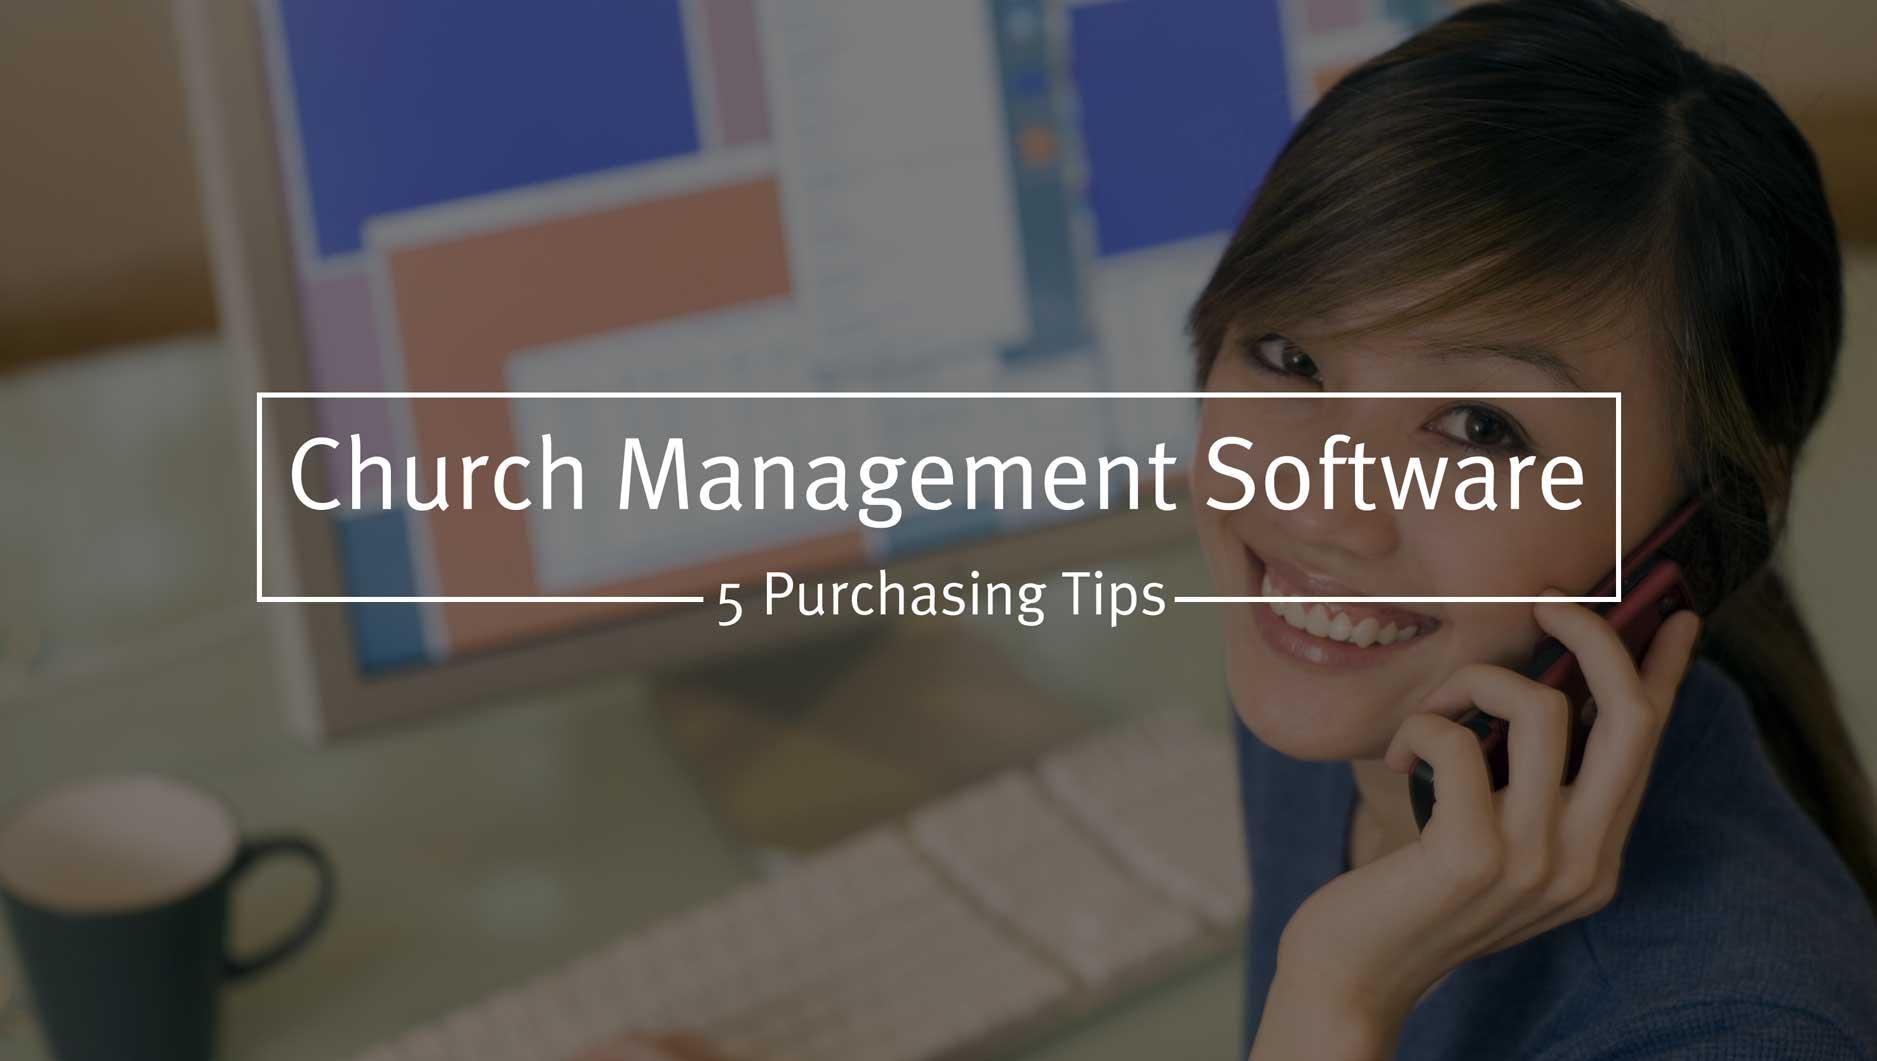 Church Management Software Purchasing